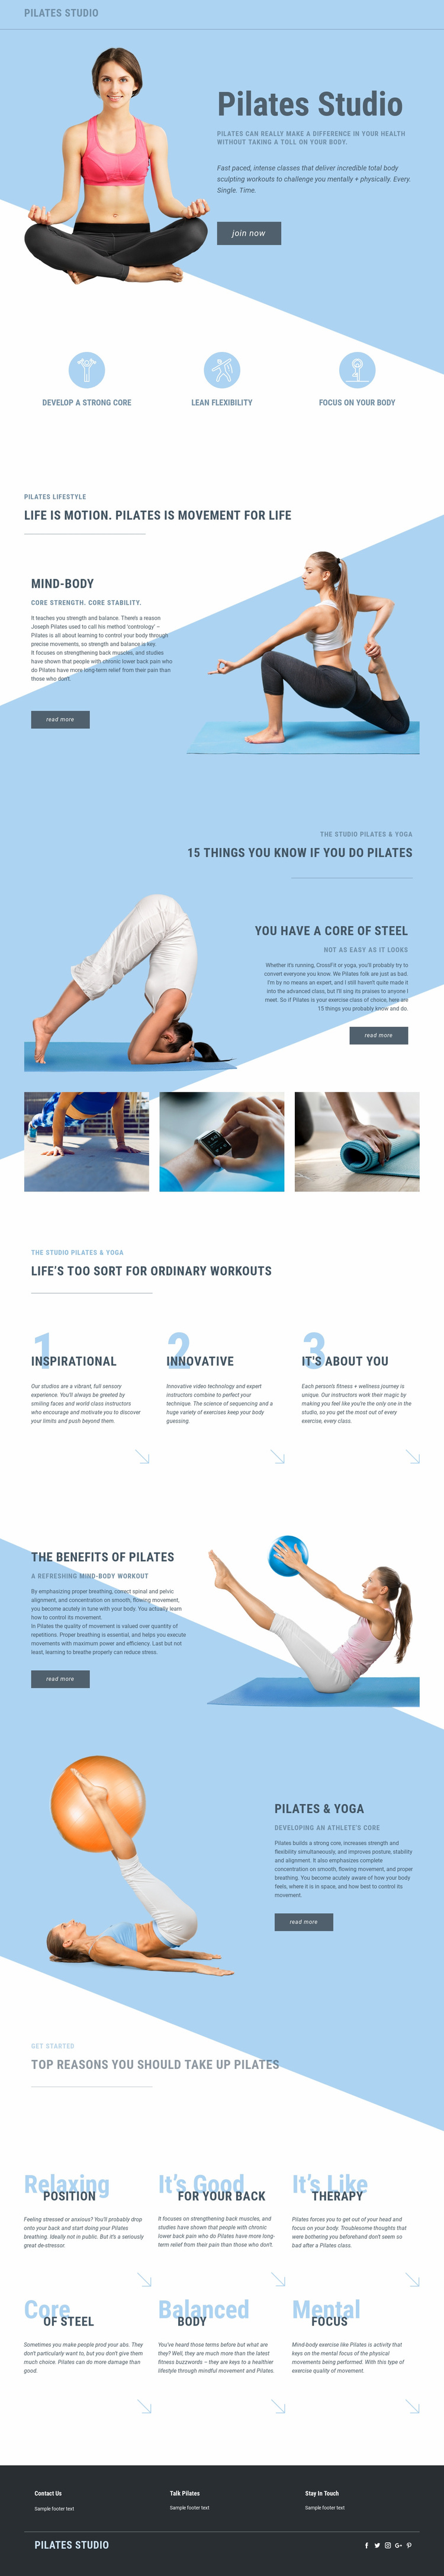 Pilates studio and sports Website Design